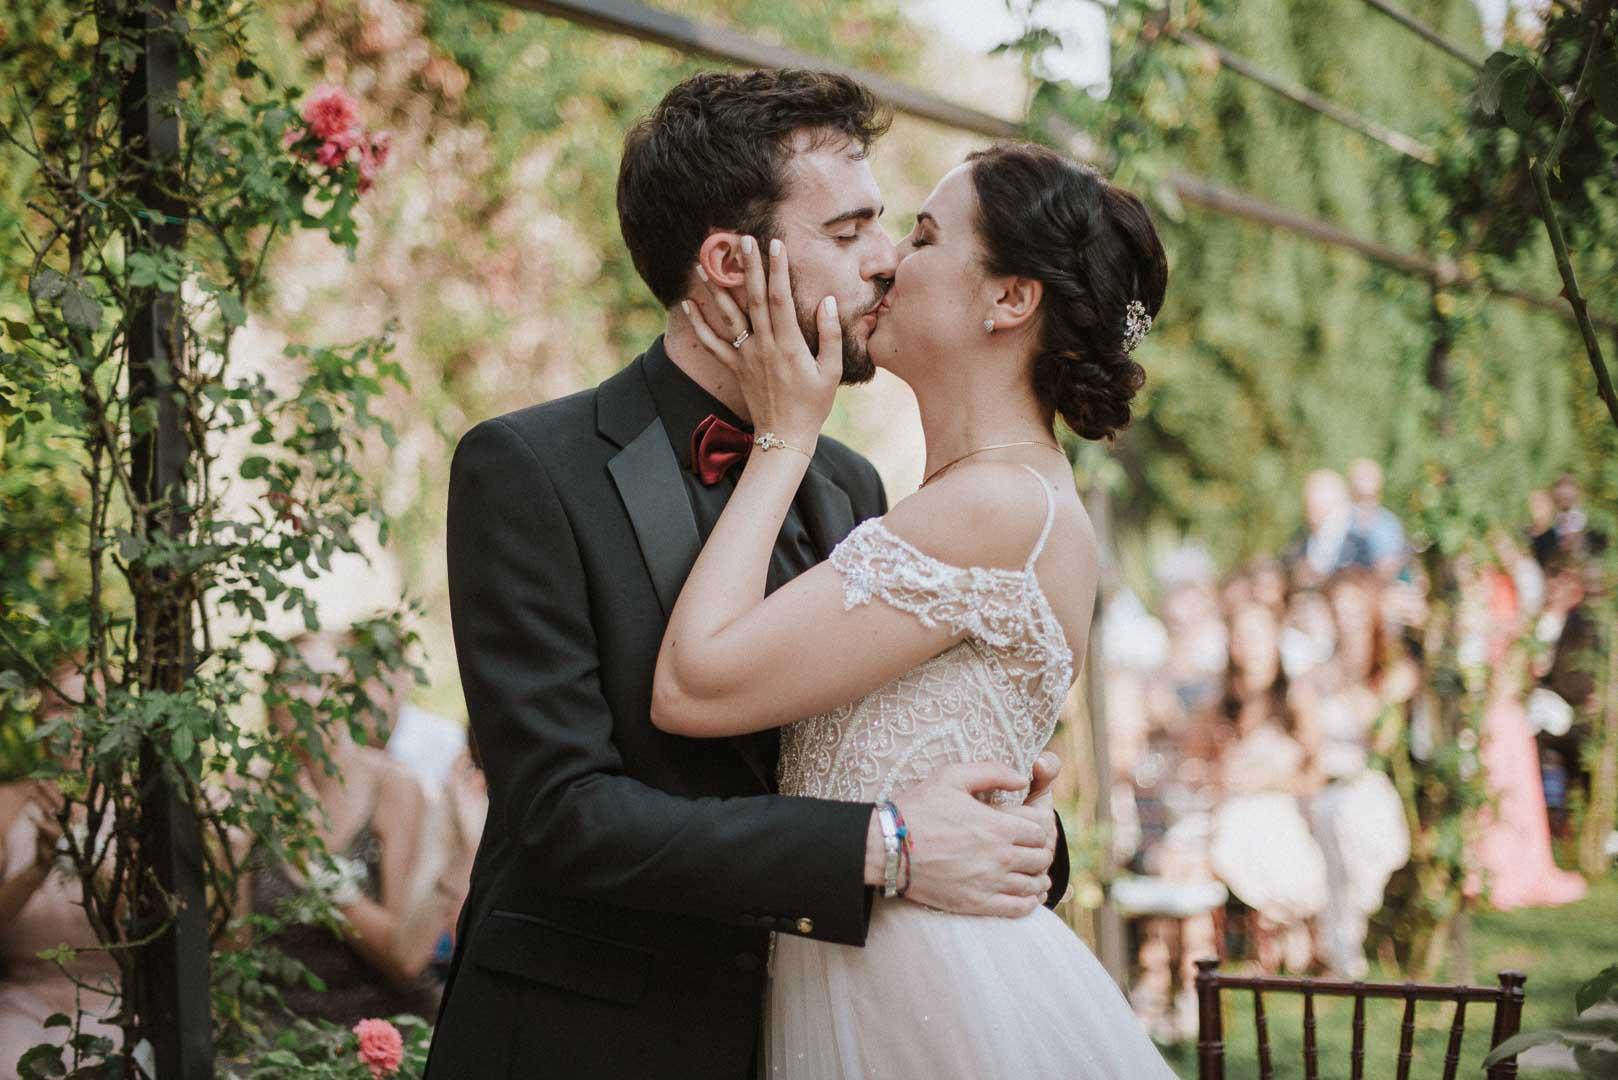 wedding-photographer-destination-fineart-bespoke-reportage-tuscany-villascorzi-vivianeizzo-spazio46-75